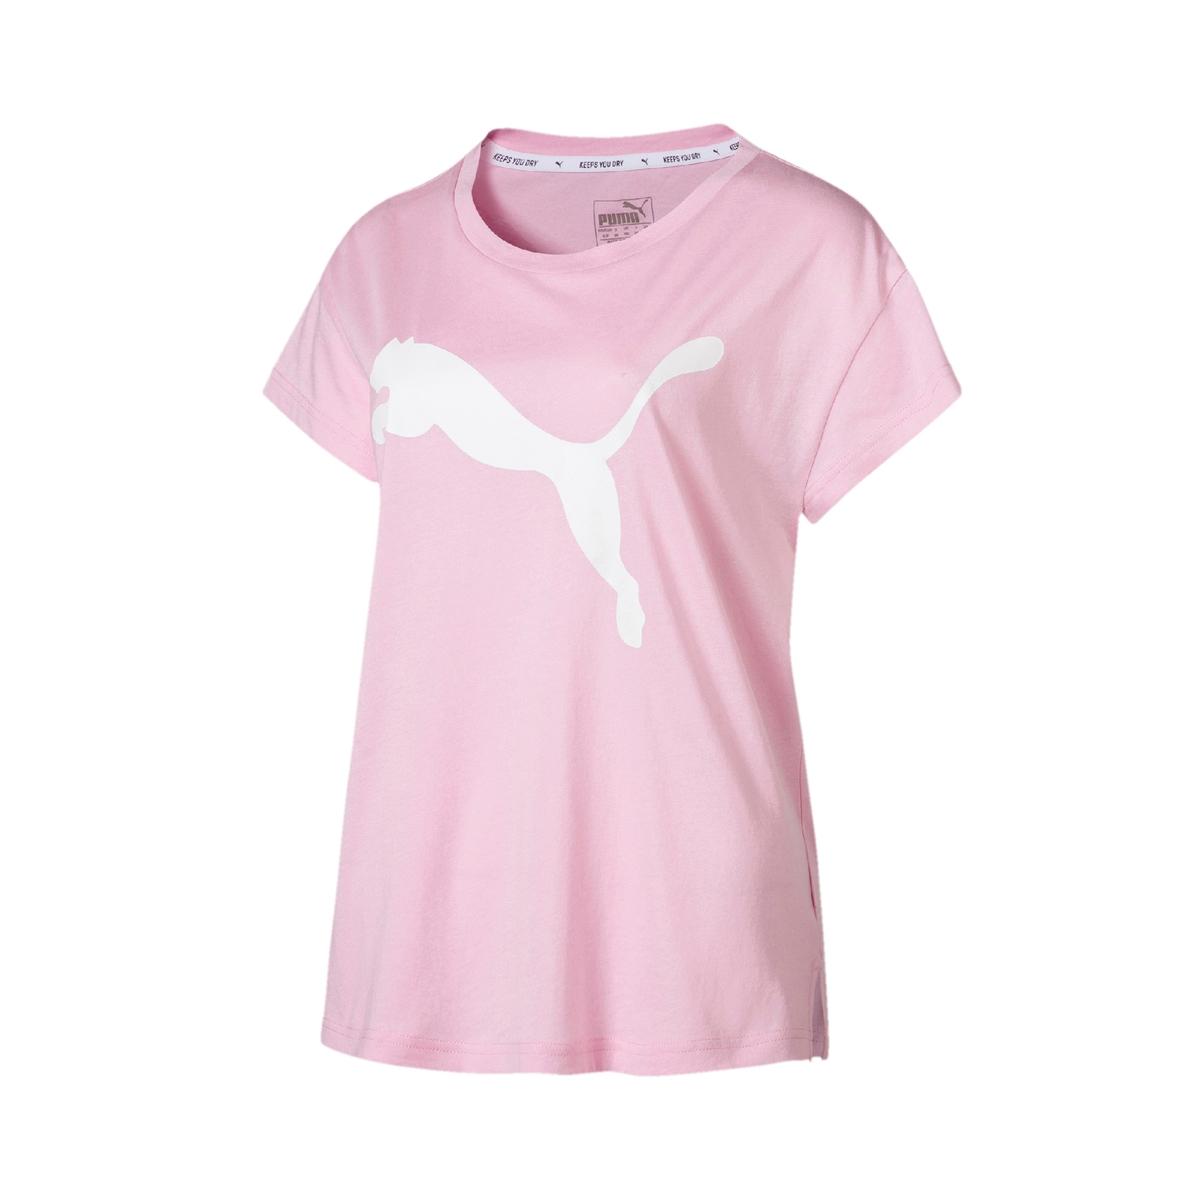 Imagen secundaria de producto de Camiseta W ELV ESS L TEE - Puma